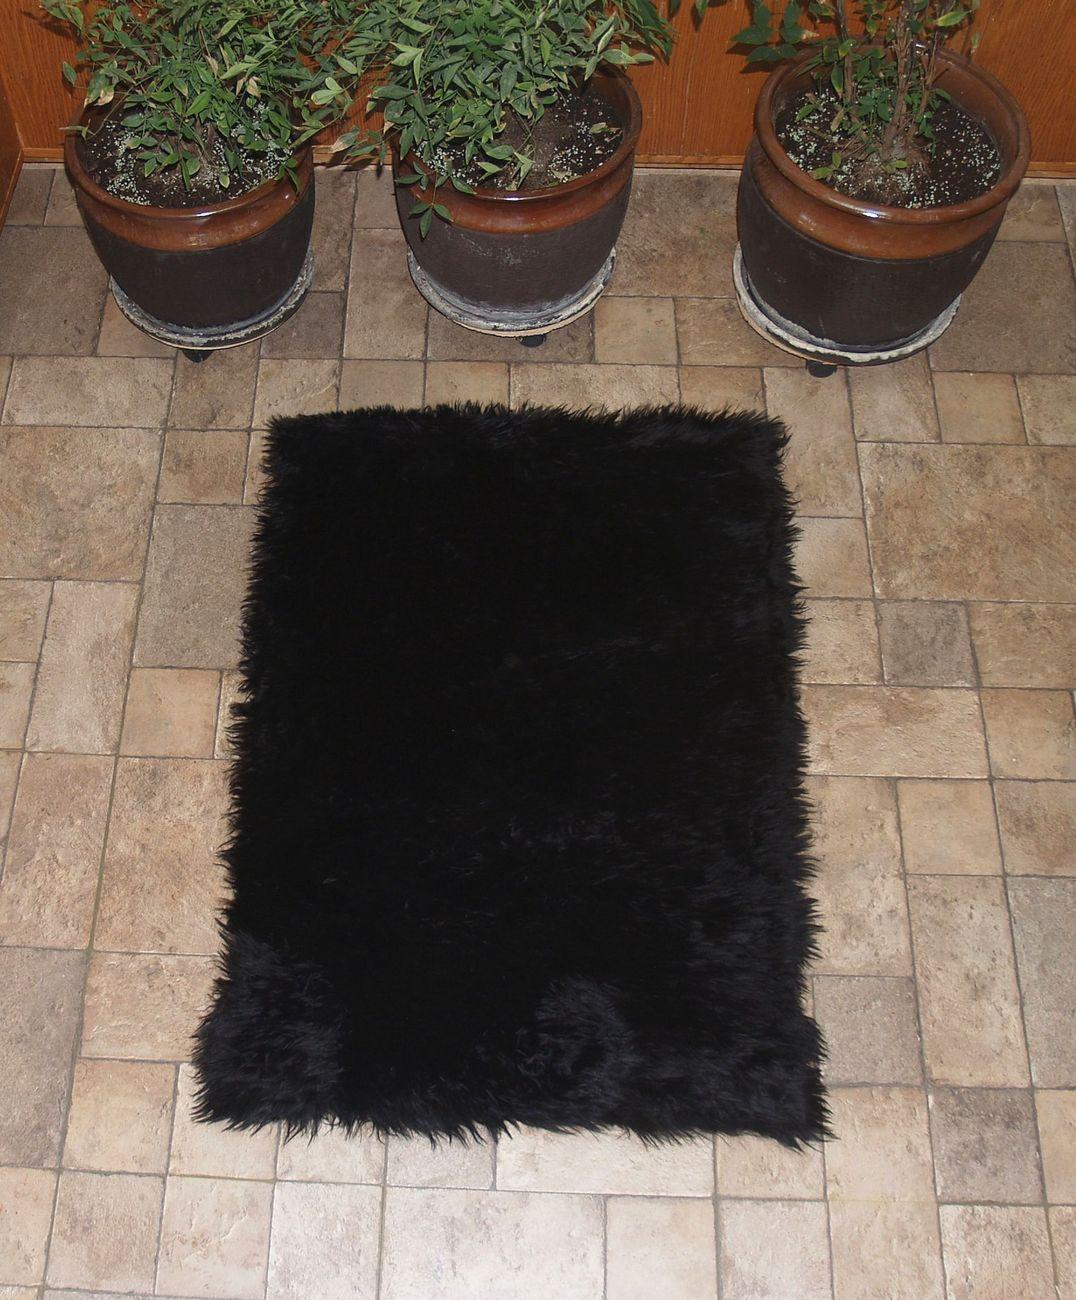 Faux Fur Area Rug Black Large